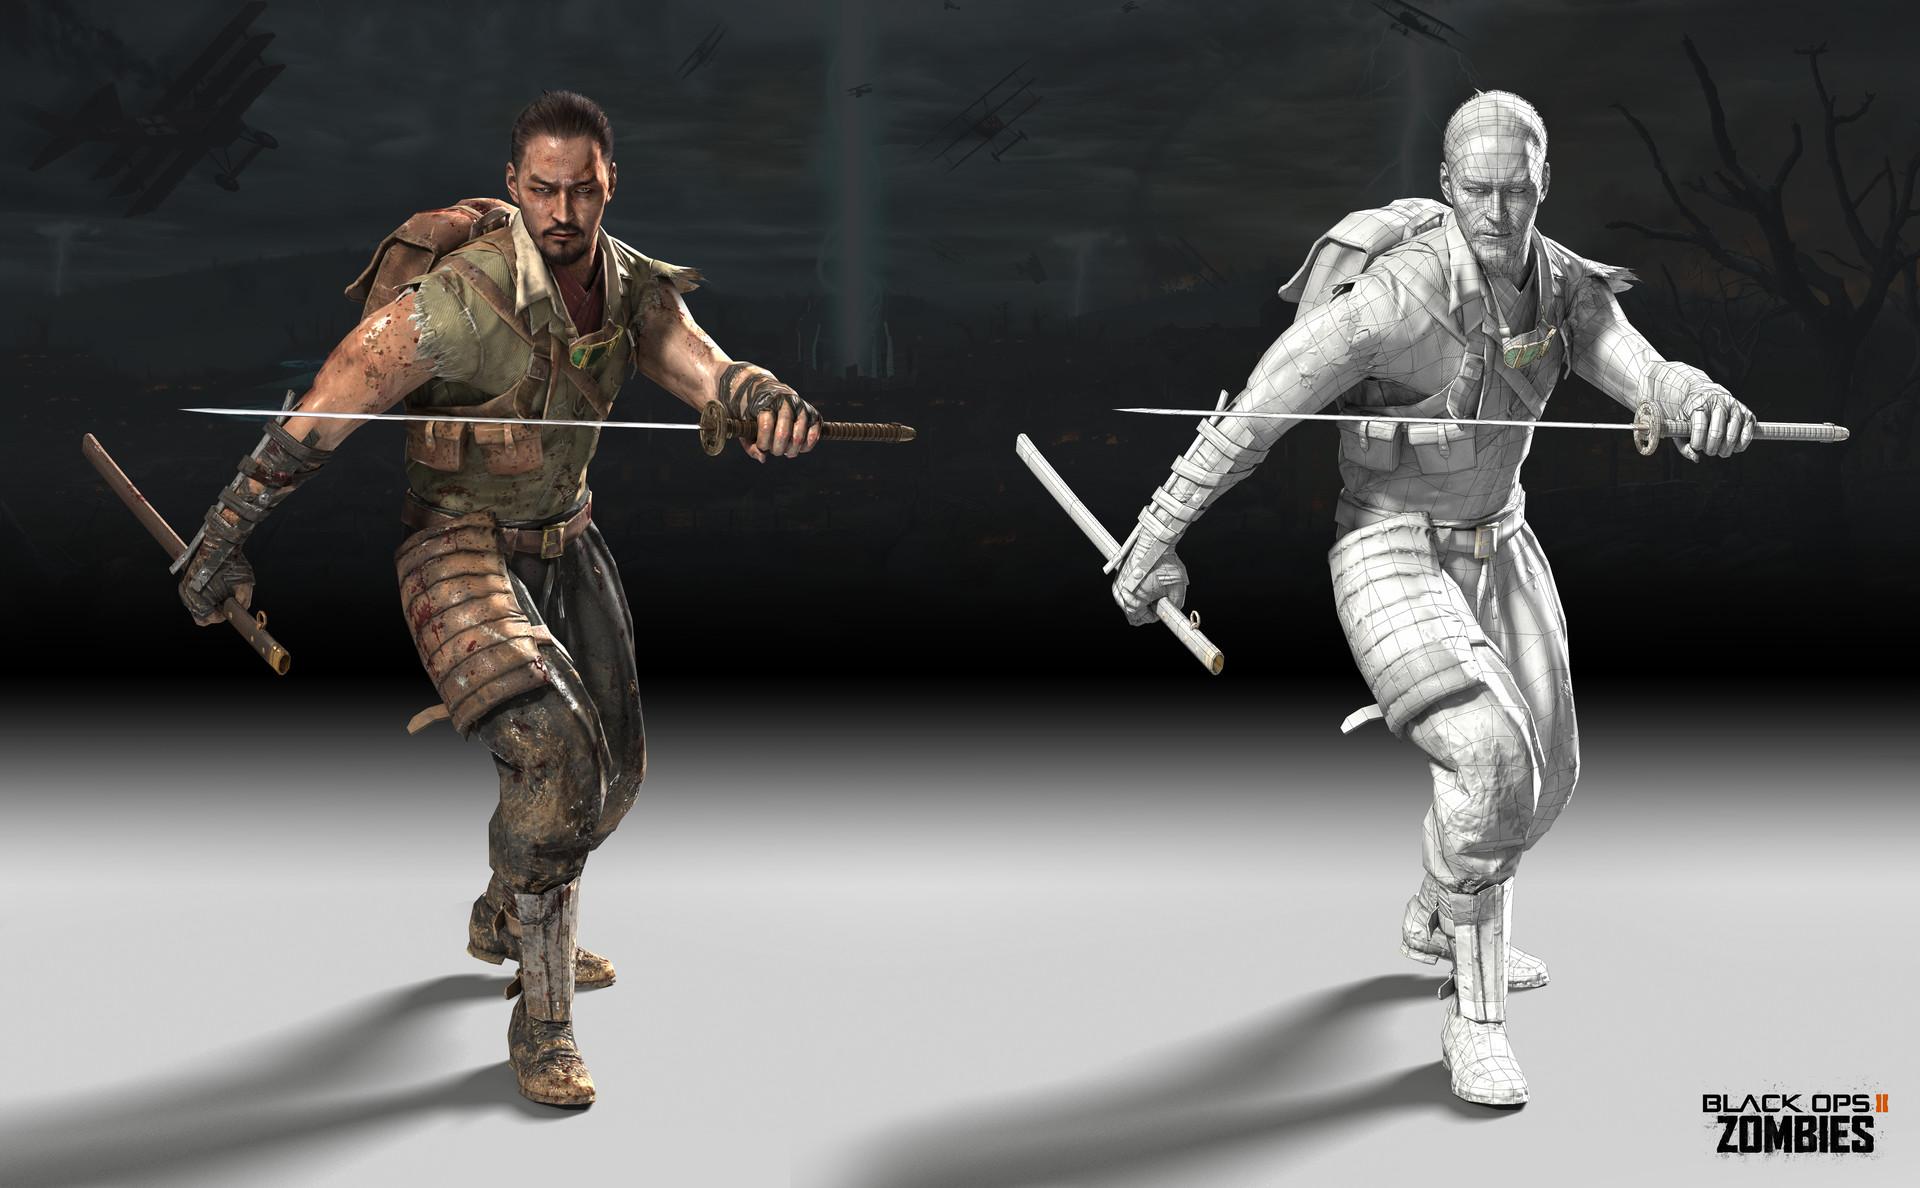 Mike Curran Takeo Masaki Call Of Duty Black Ops 2 2013